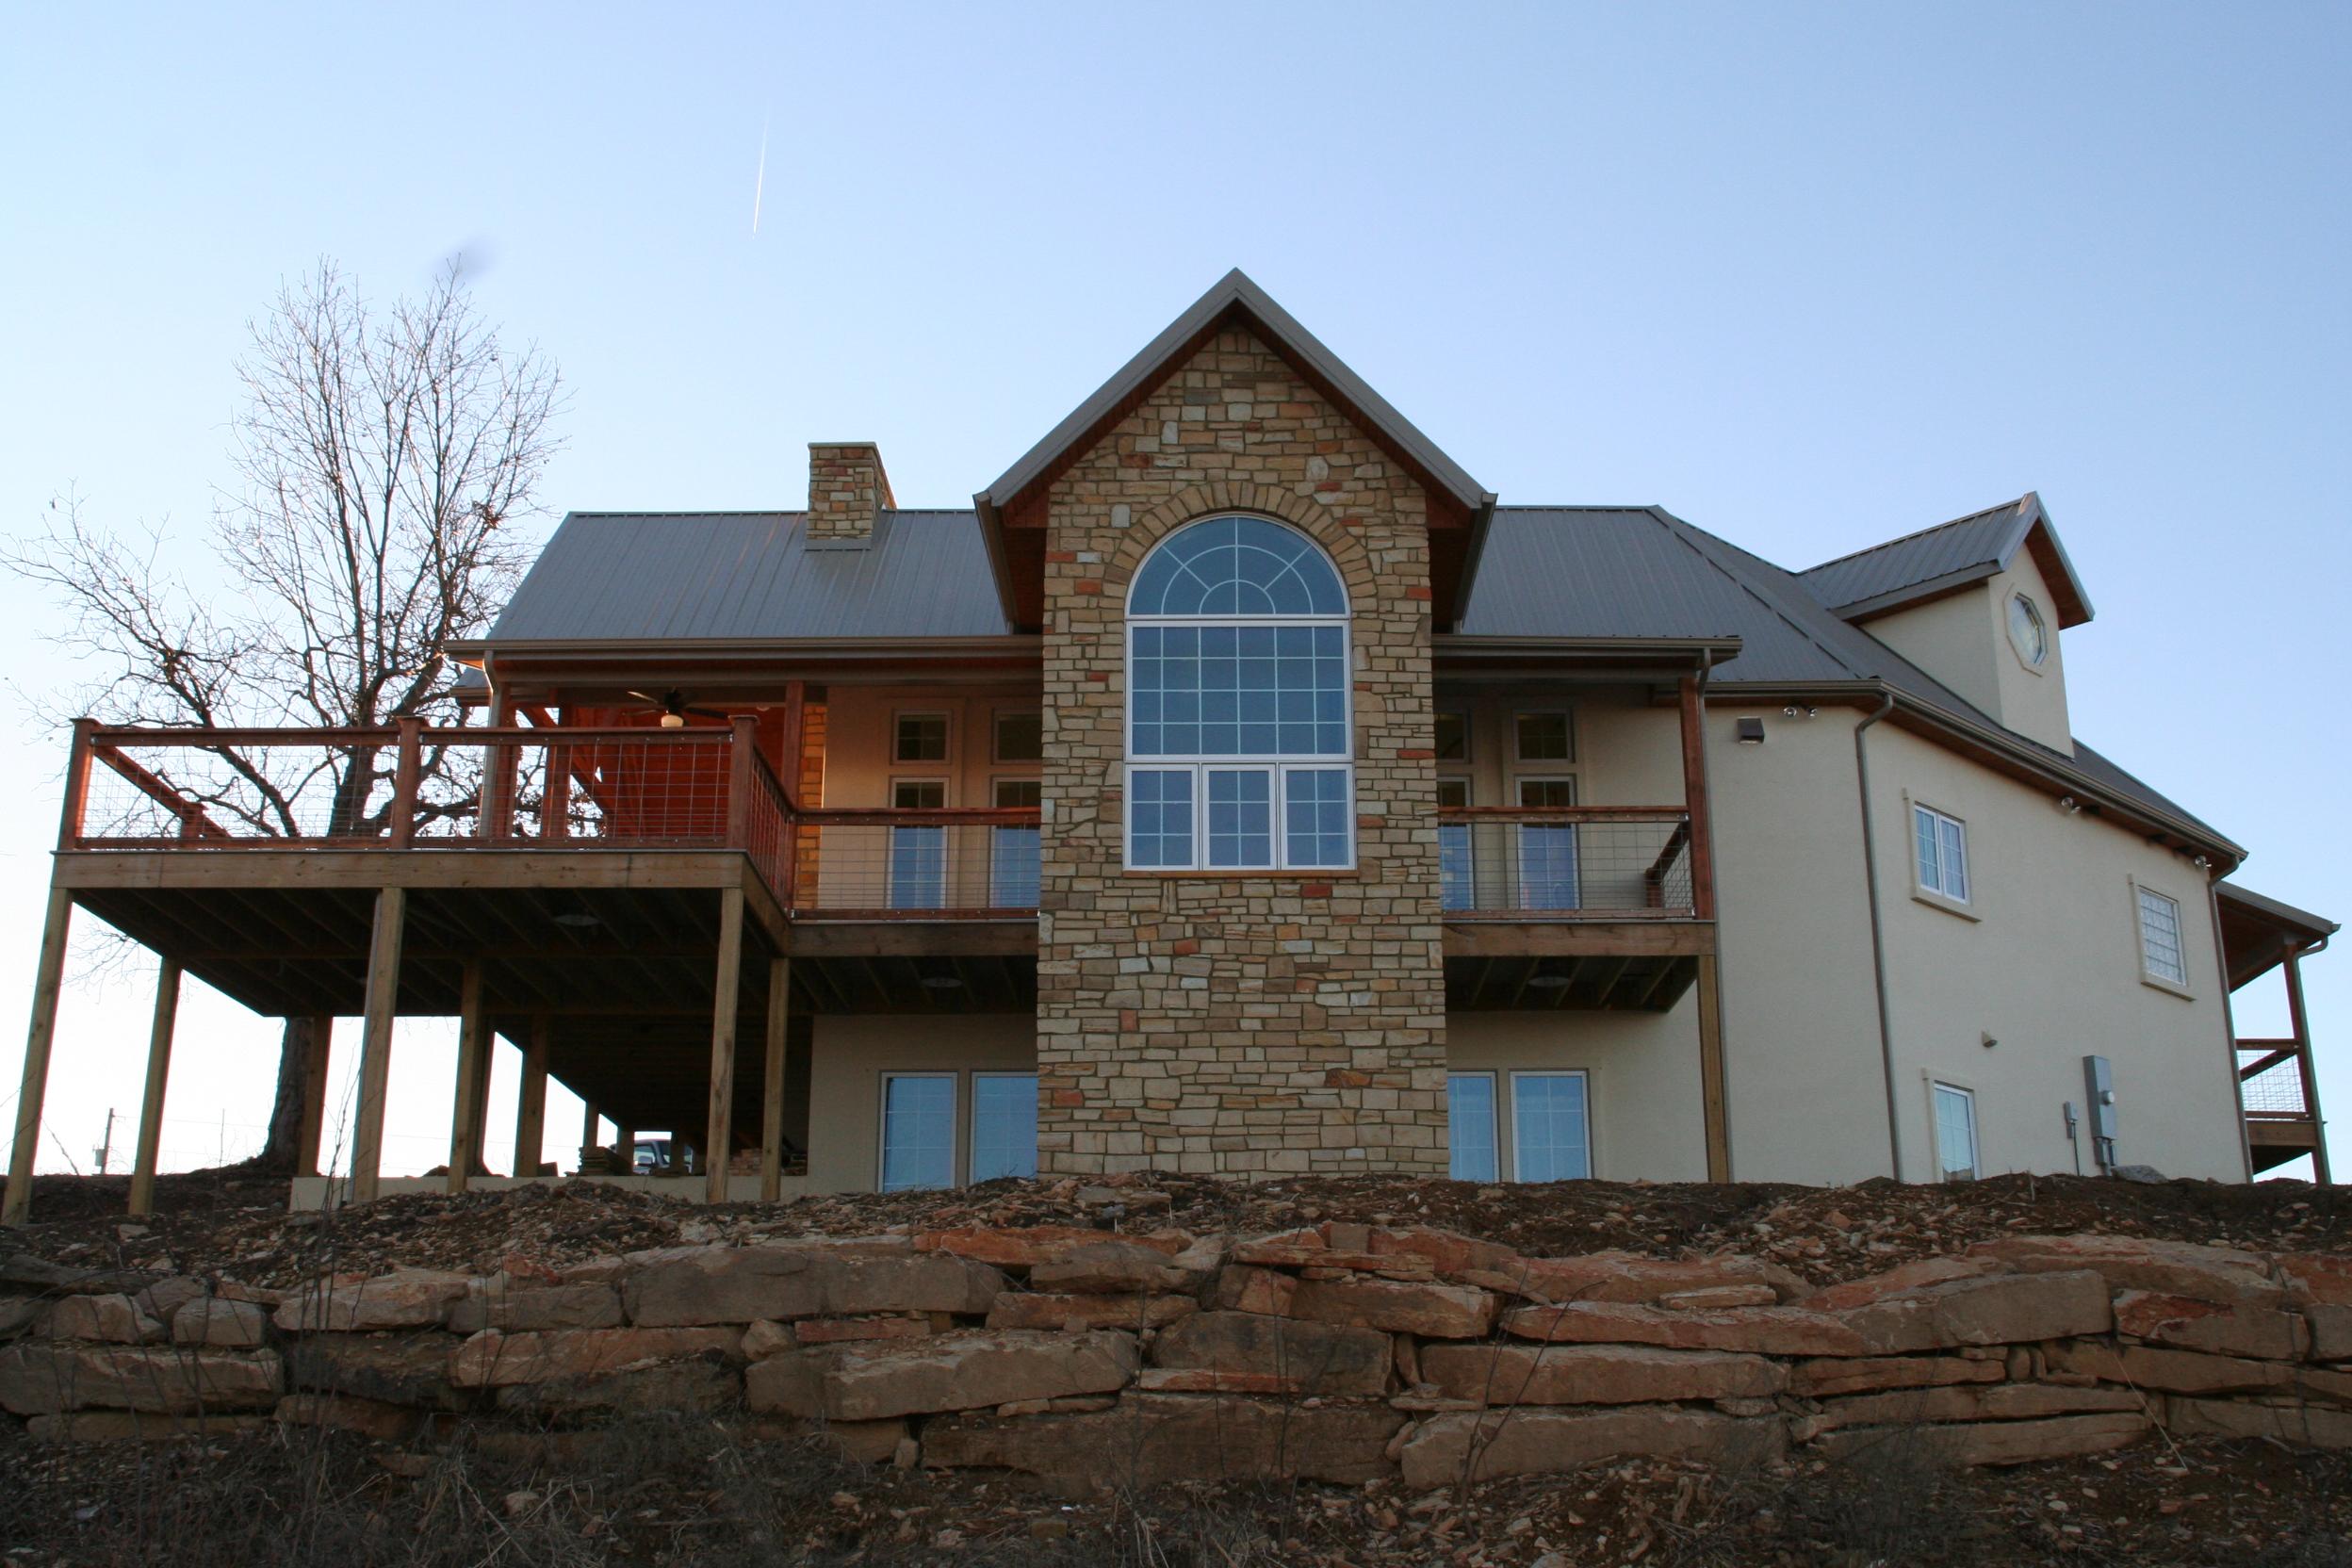 2011 ICF Builder Award